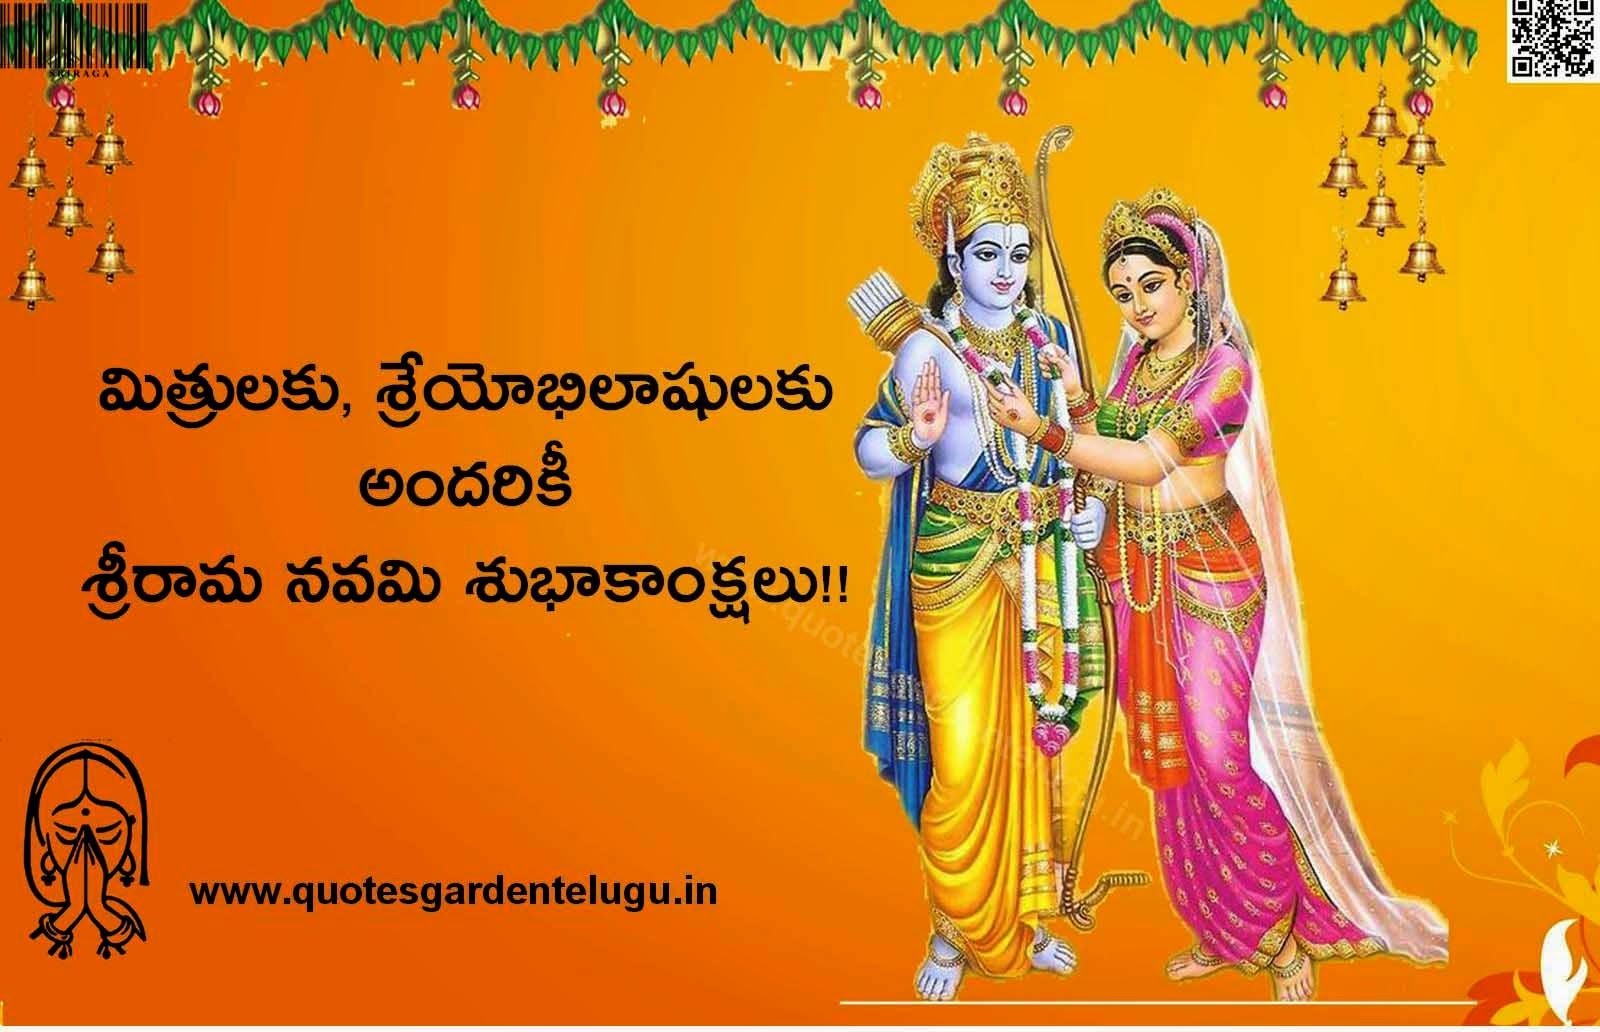 Telugu Srirama Navami greetings, Telugu Srirama Navami wishes, Telugu Srirama Navami messages, Telugu Srirama Navami images